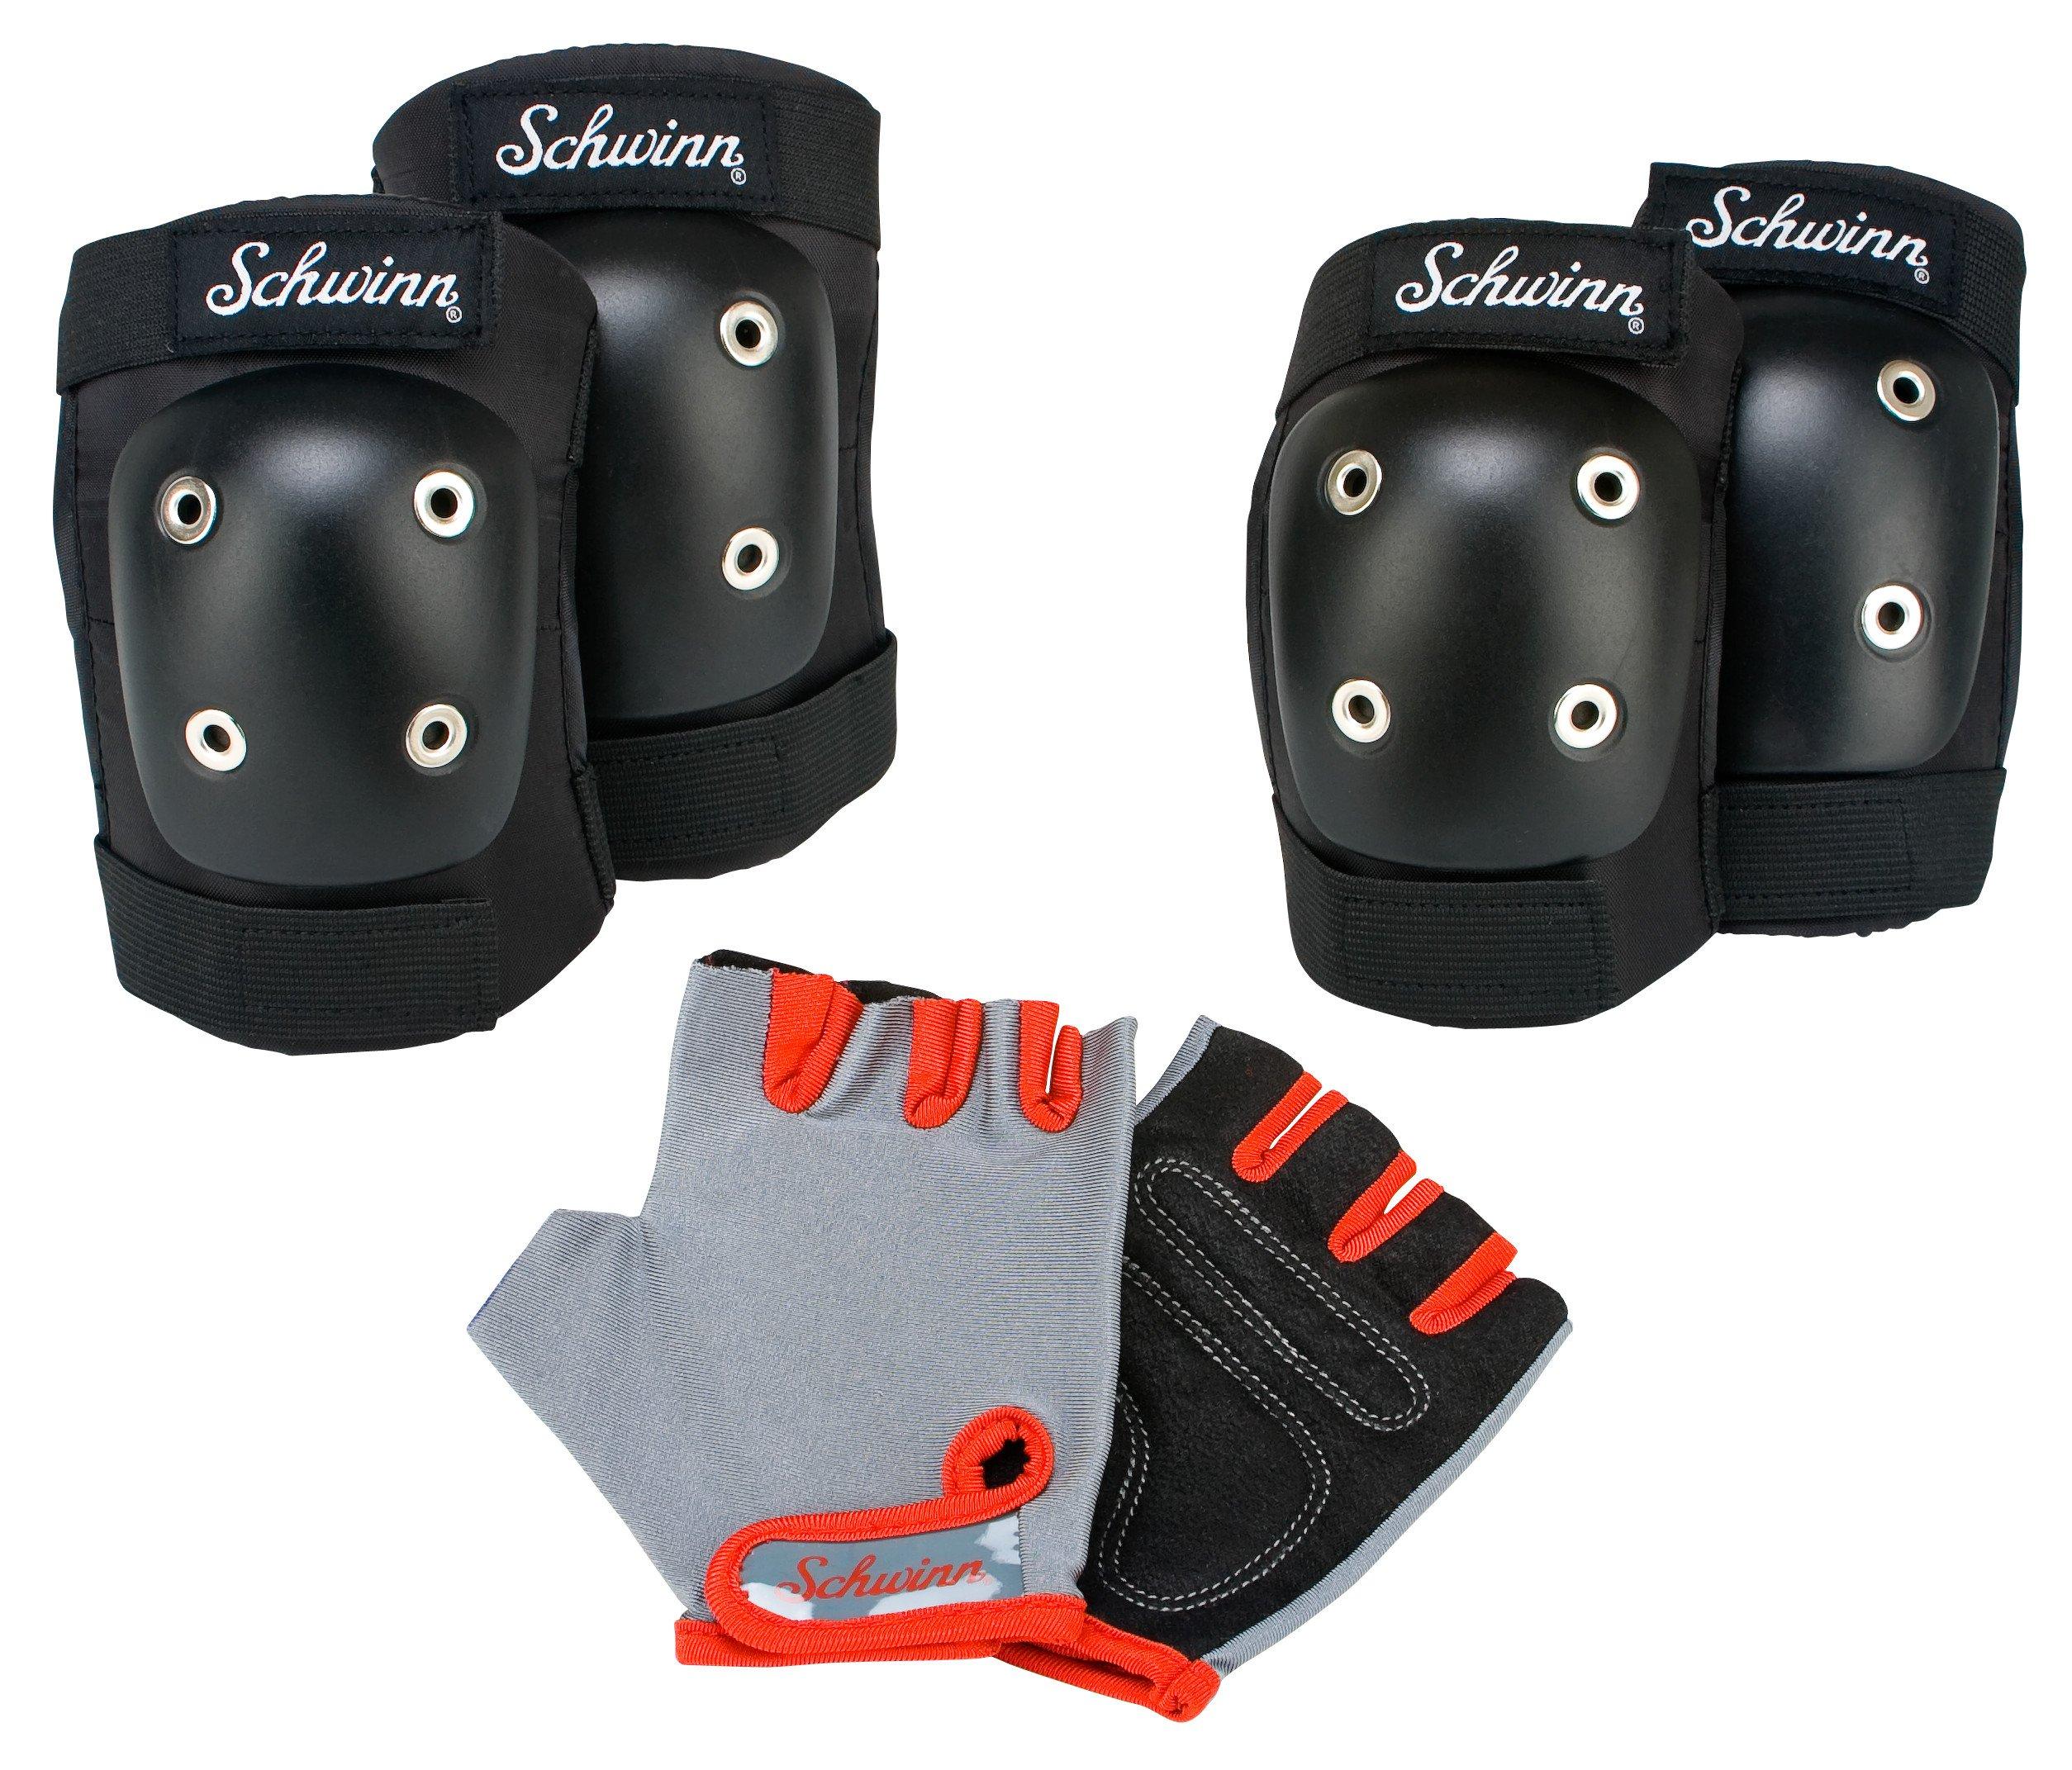 Schwinn Kids Protective Bike Gloves, Knee and Elbow Pads